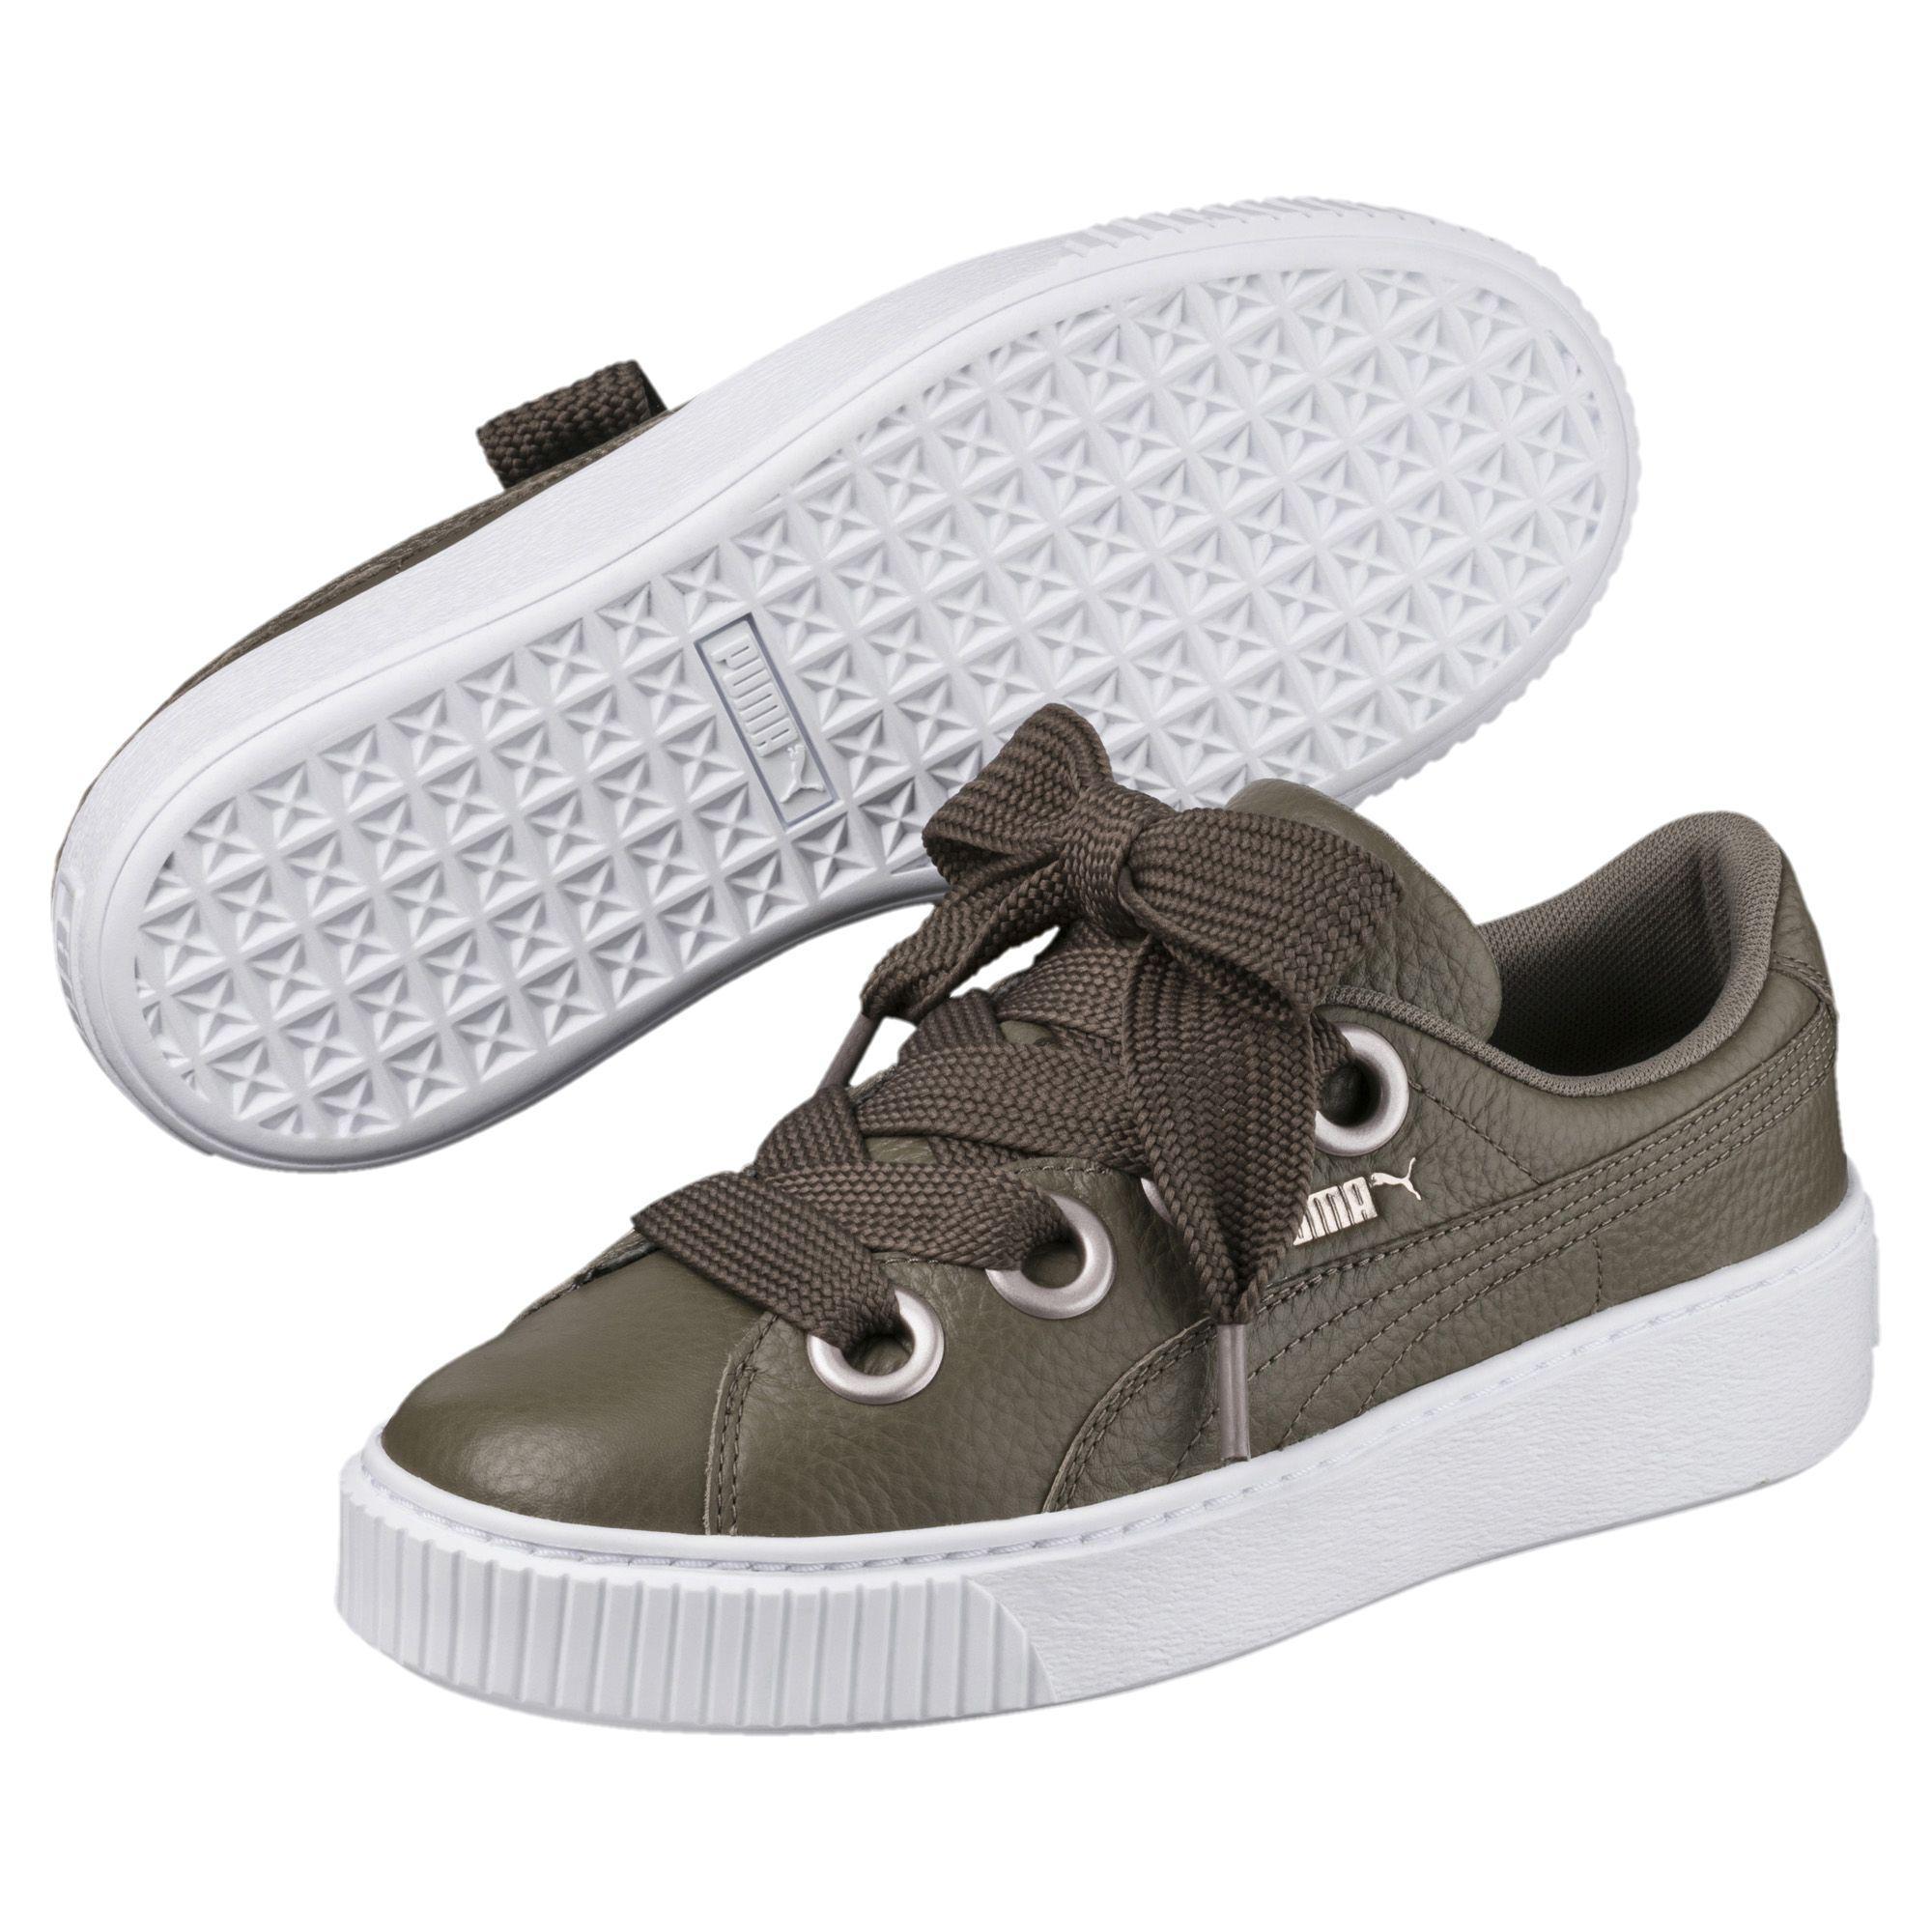 PUMA Platform Kiss Leather Women's Sneakers - Lyst